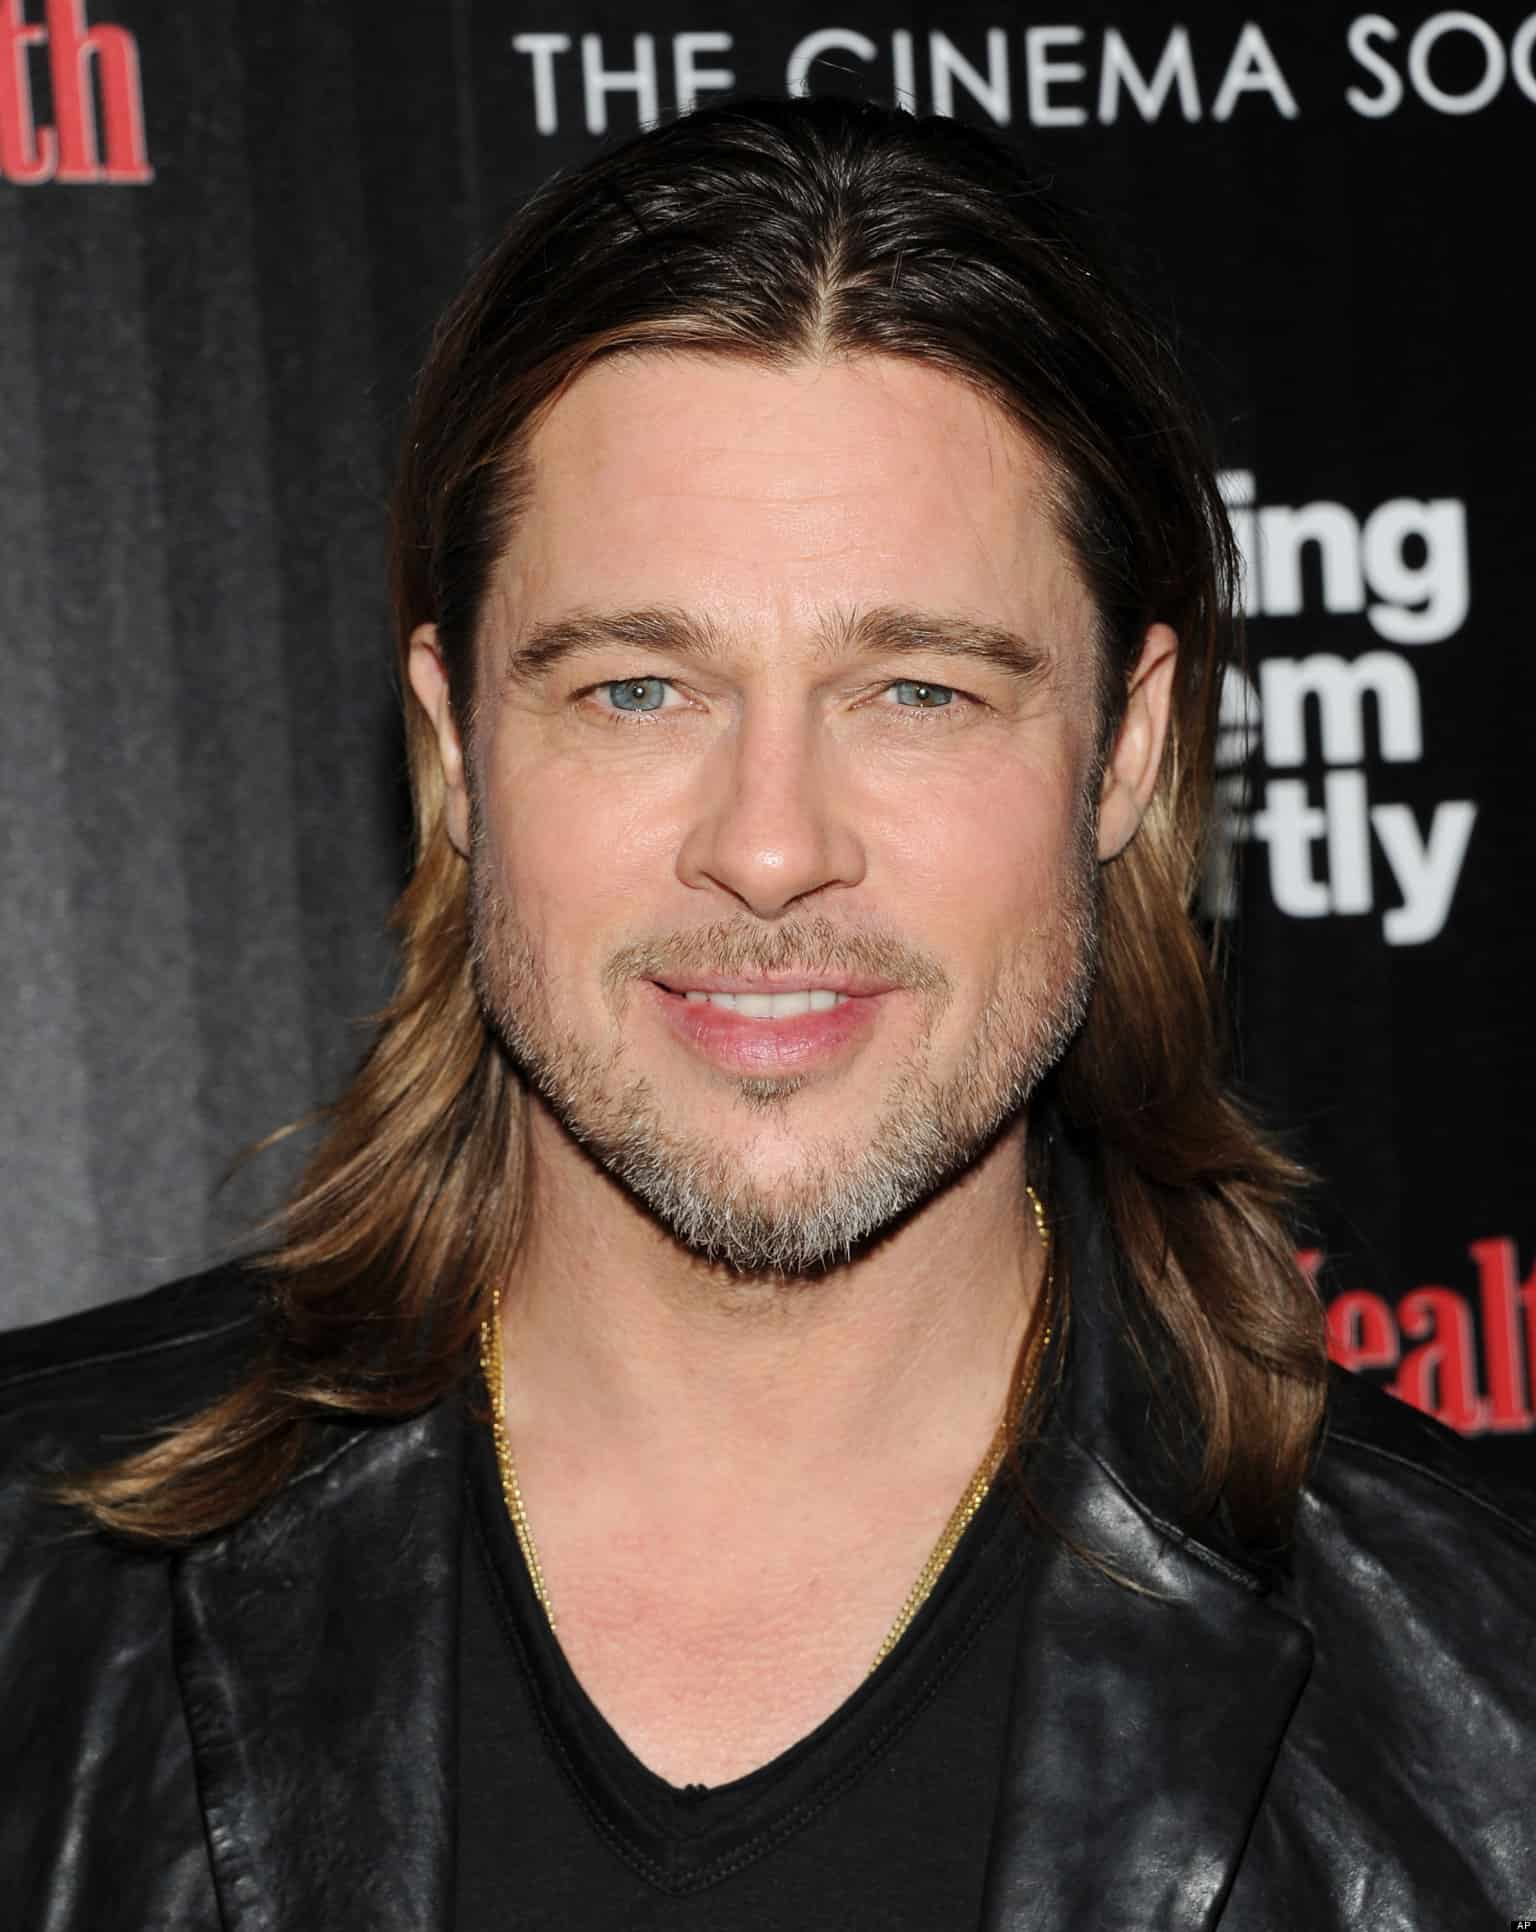 60 Charming Brad Pitt Hairstyles - Styling Ideas (2019) Brad Pitt